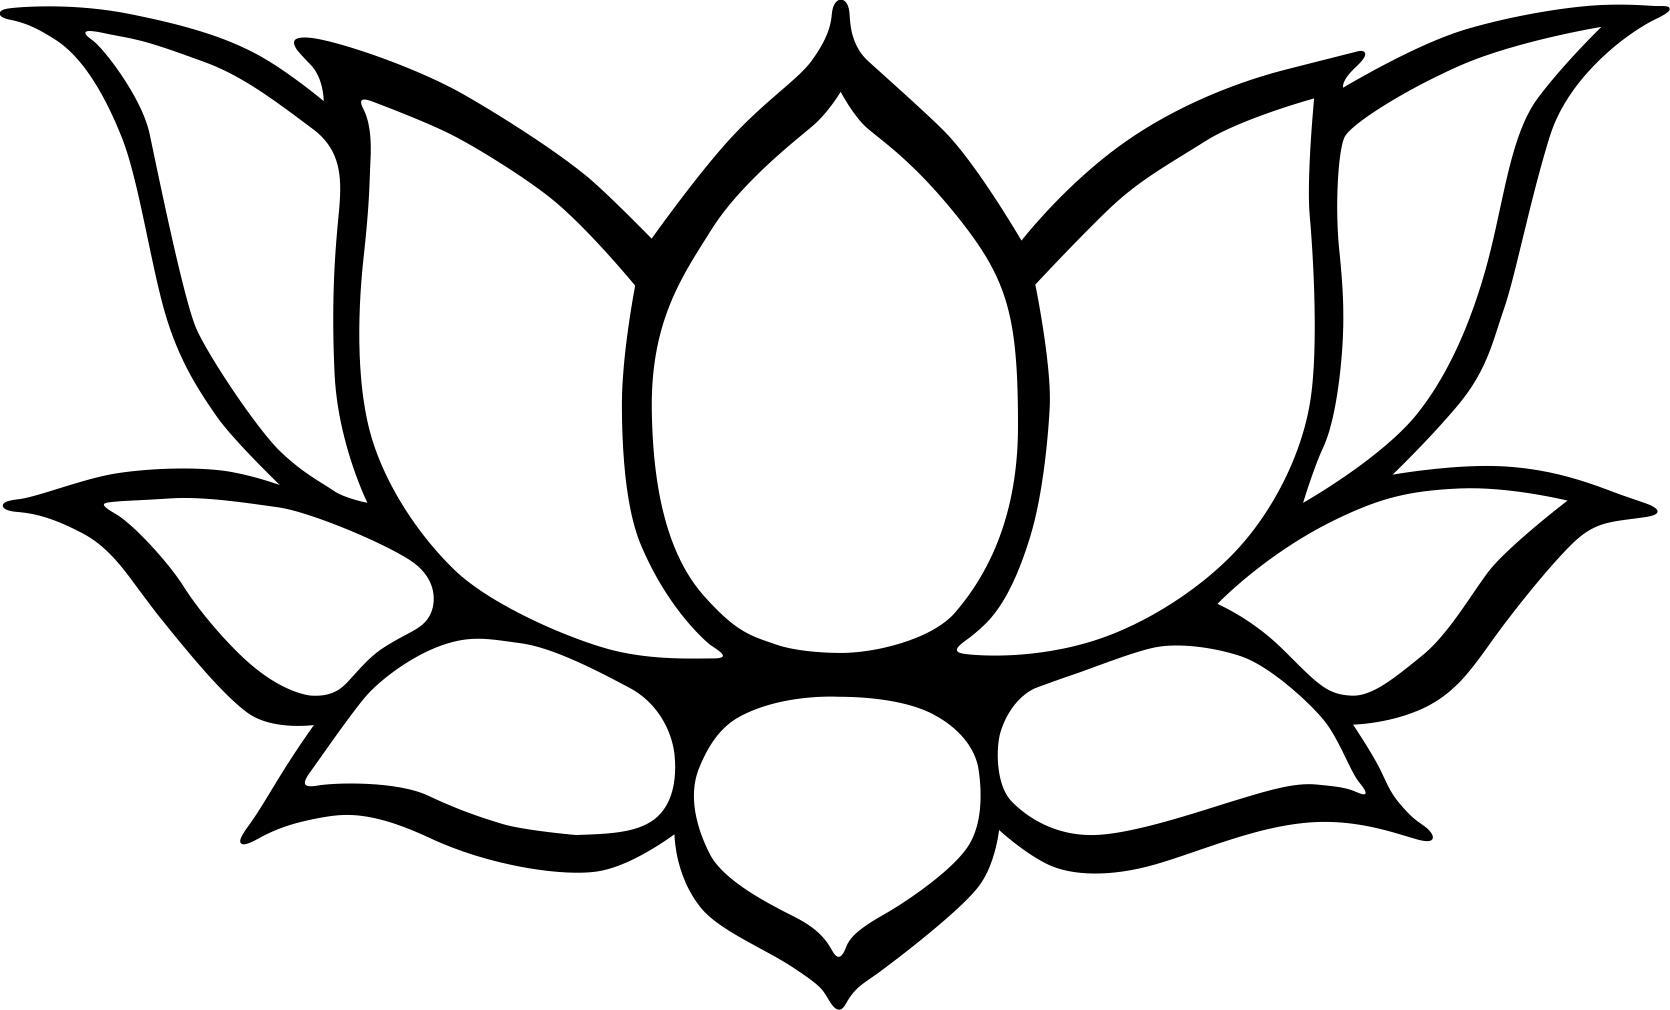 Clip Art Black And White Lotus Flower Clipart.